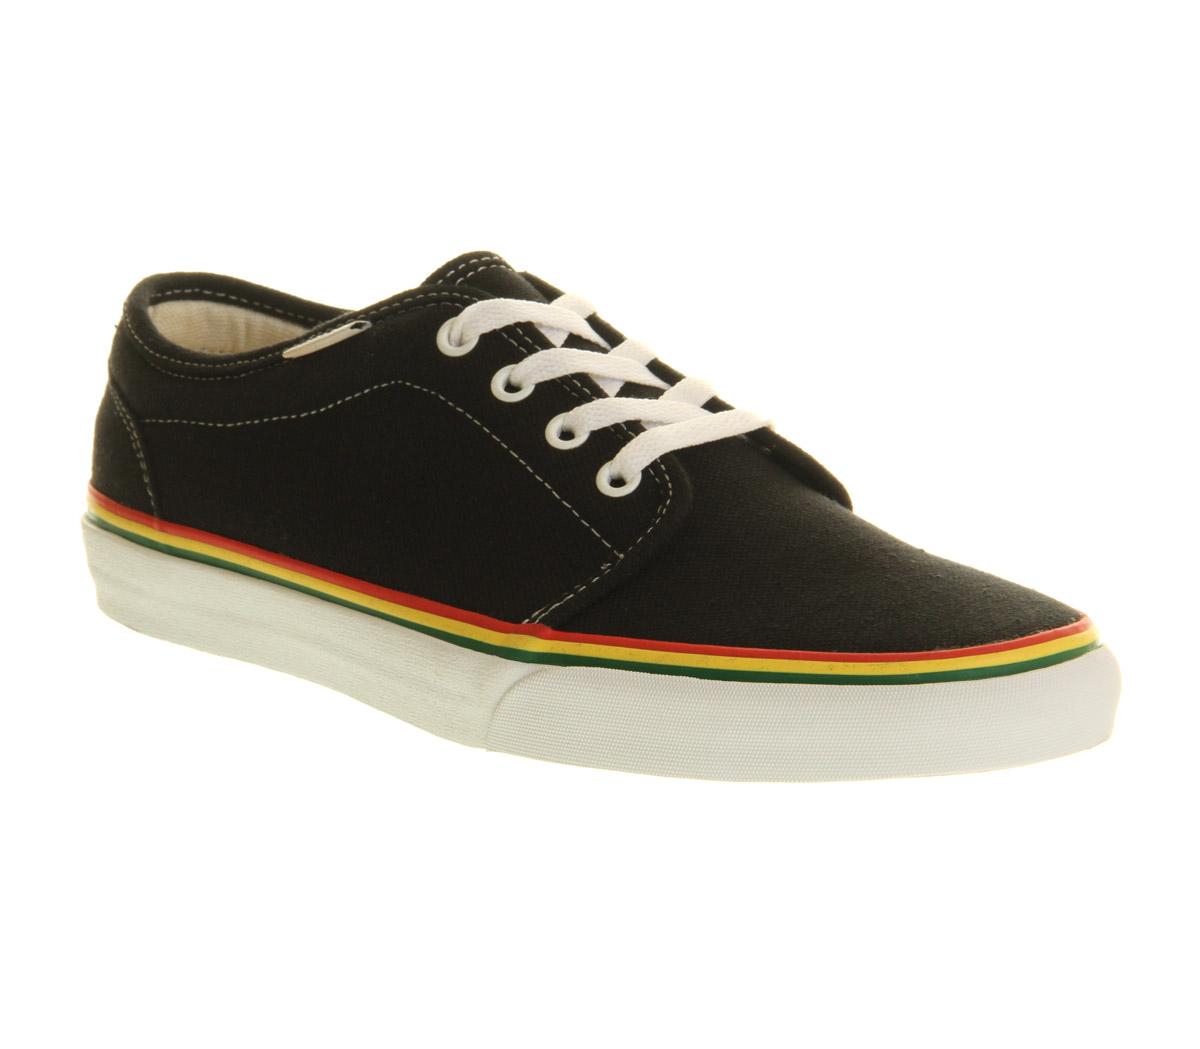 Vans Hemp Shoes Rasta